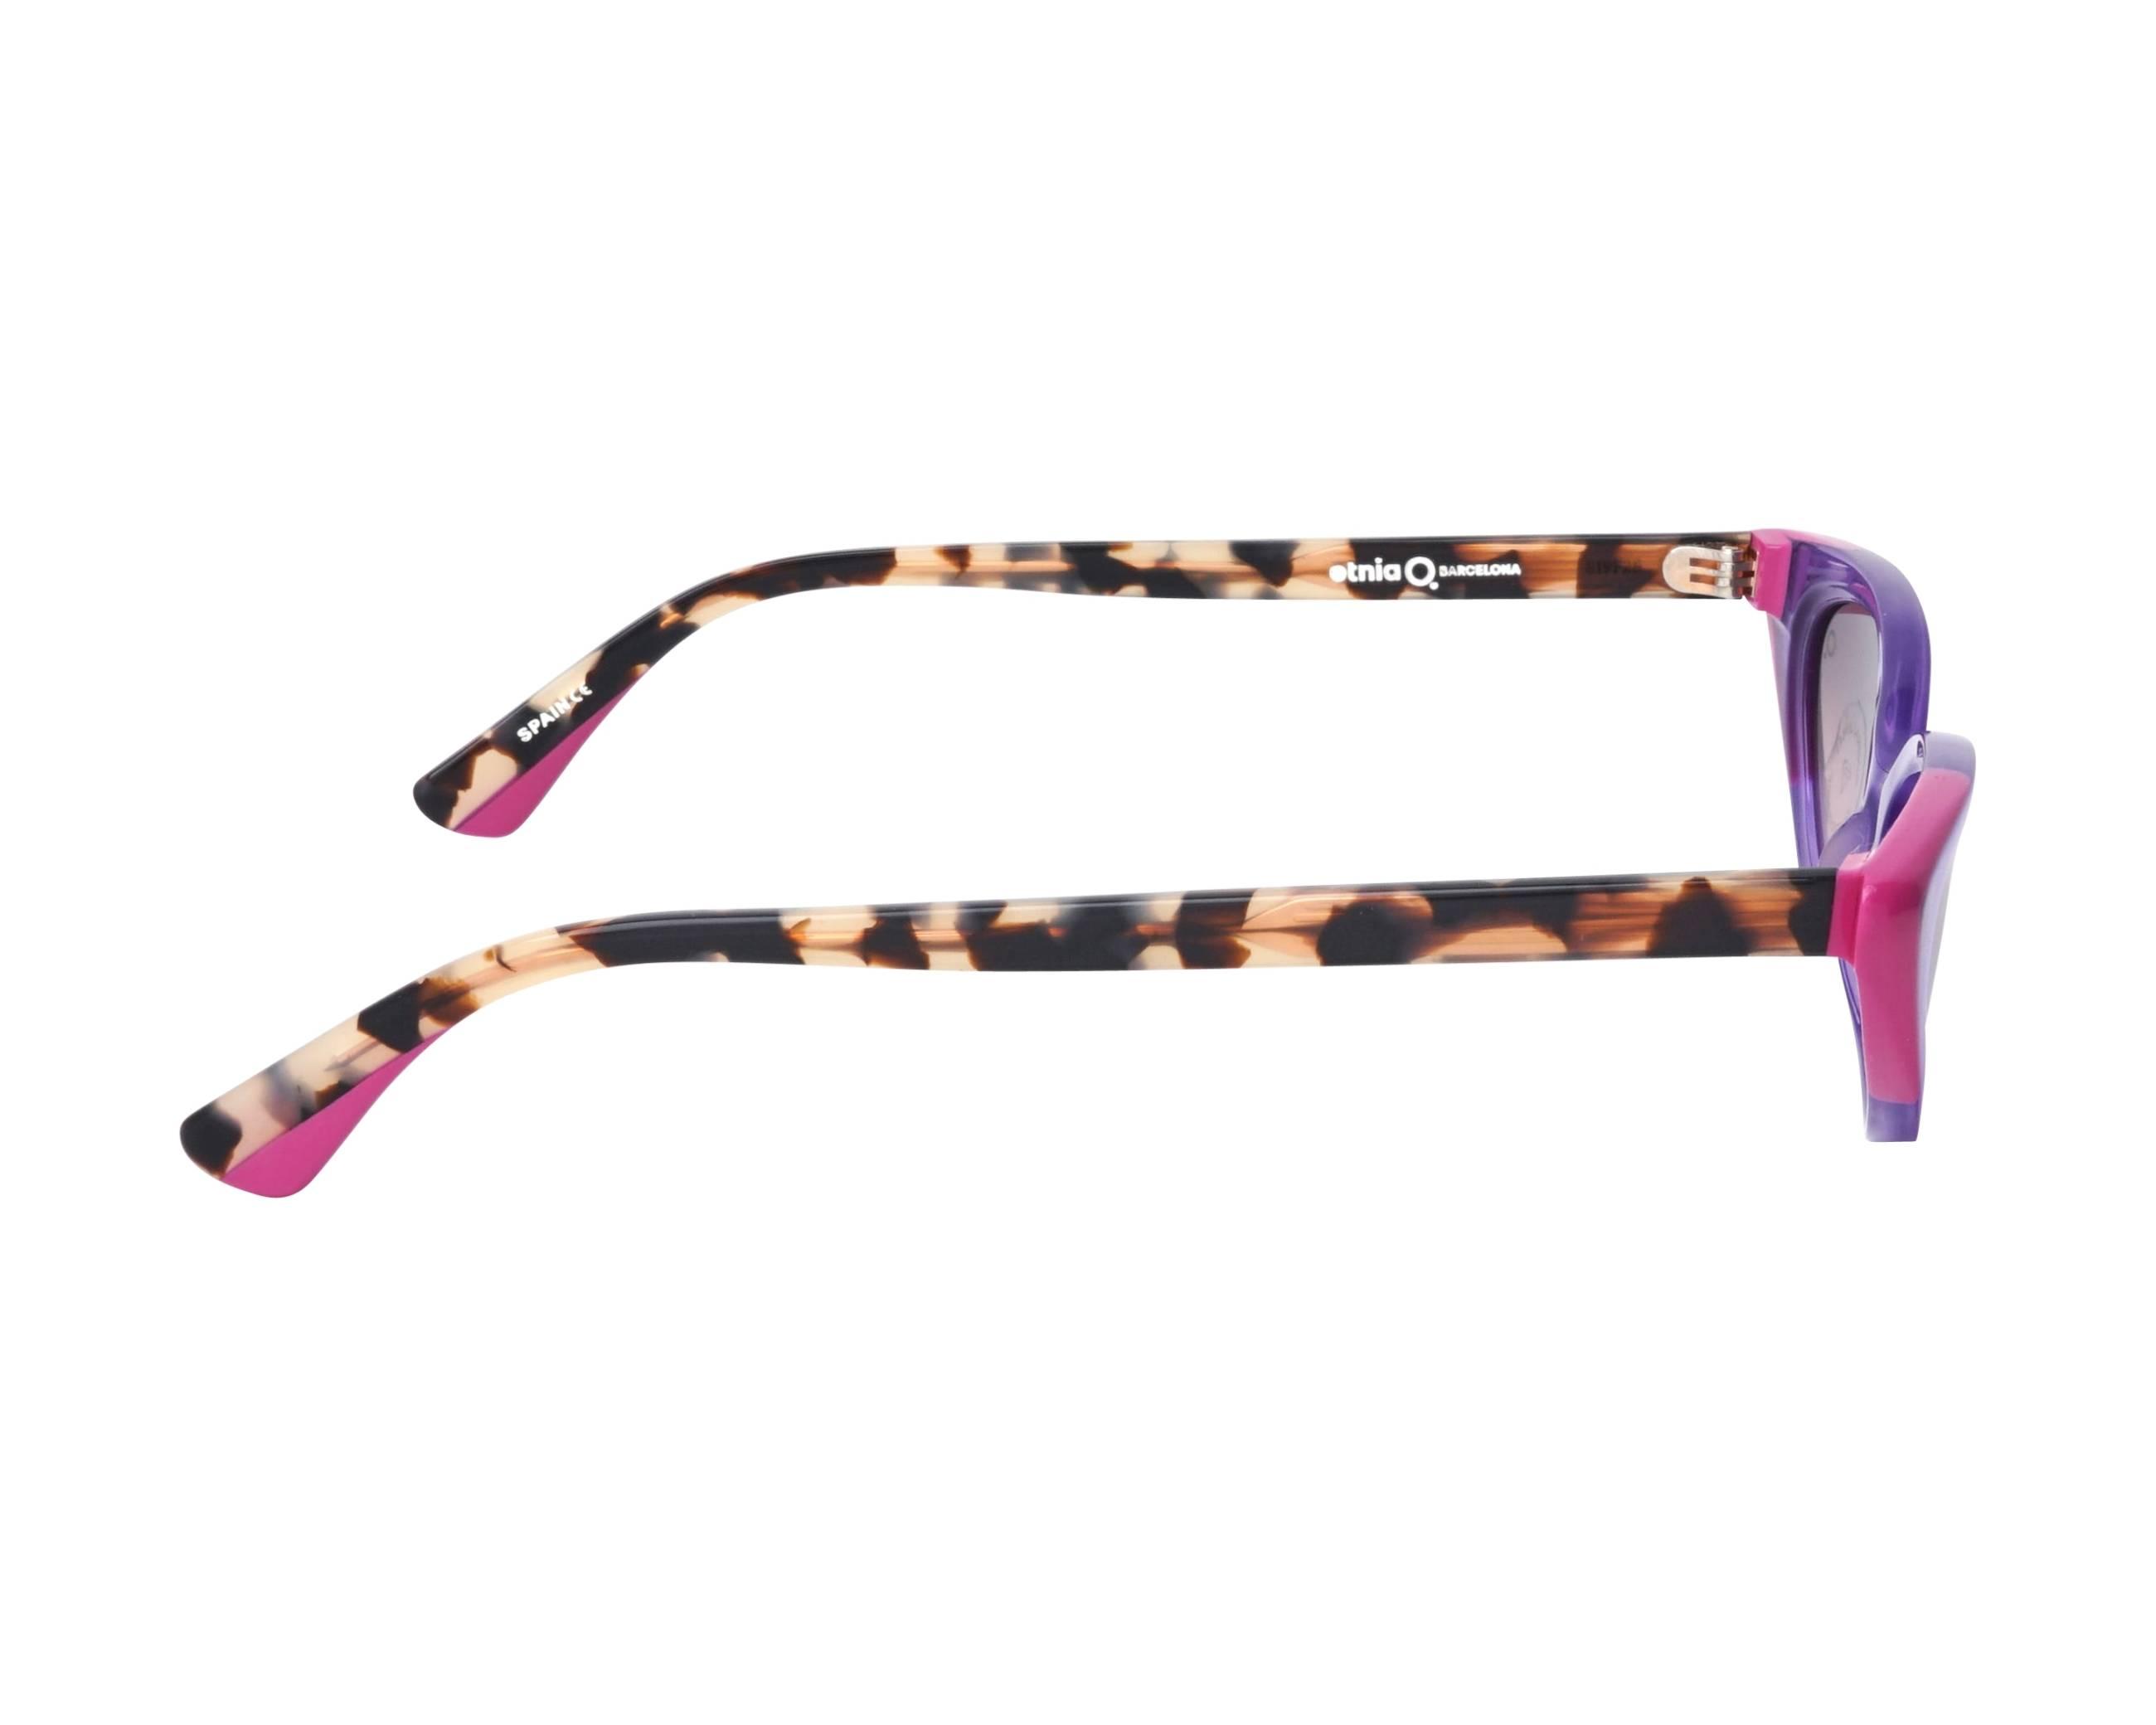 cf51cbd6f2 Sunglasses Etnia Barcelona BANDAI PUHV 51-18 Violet Brown side view